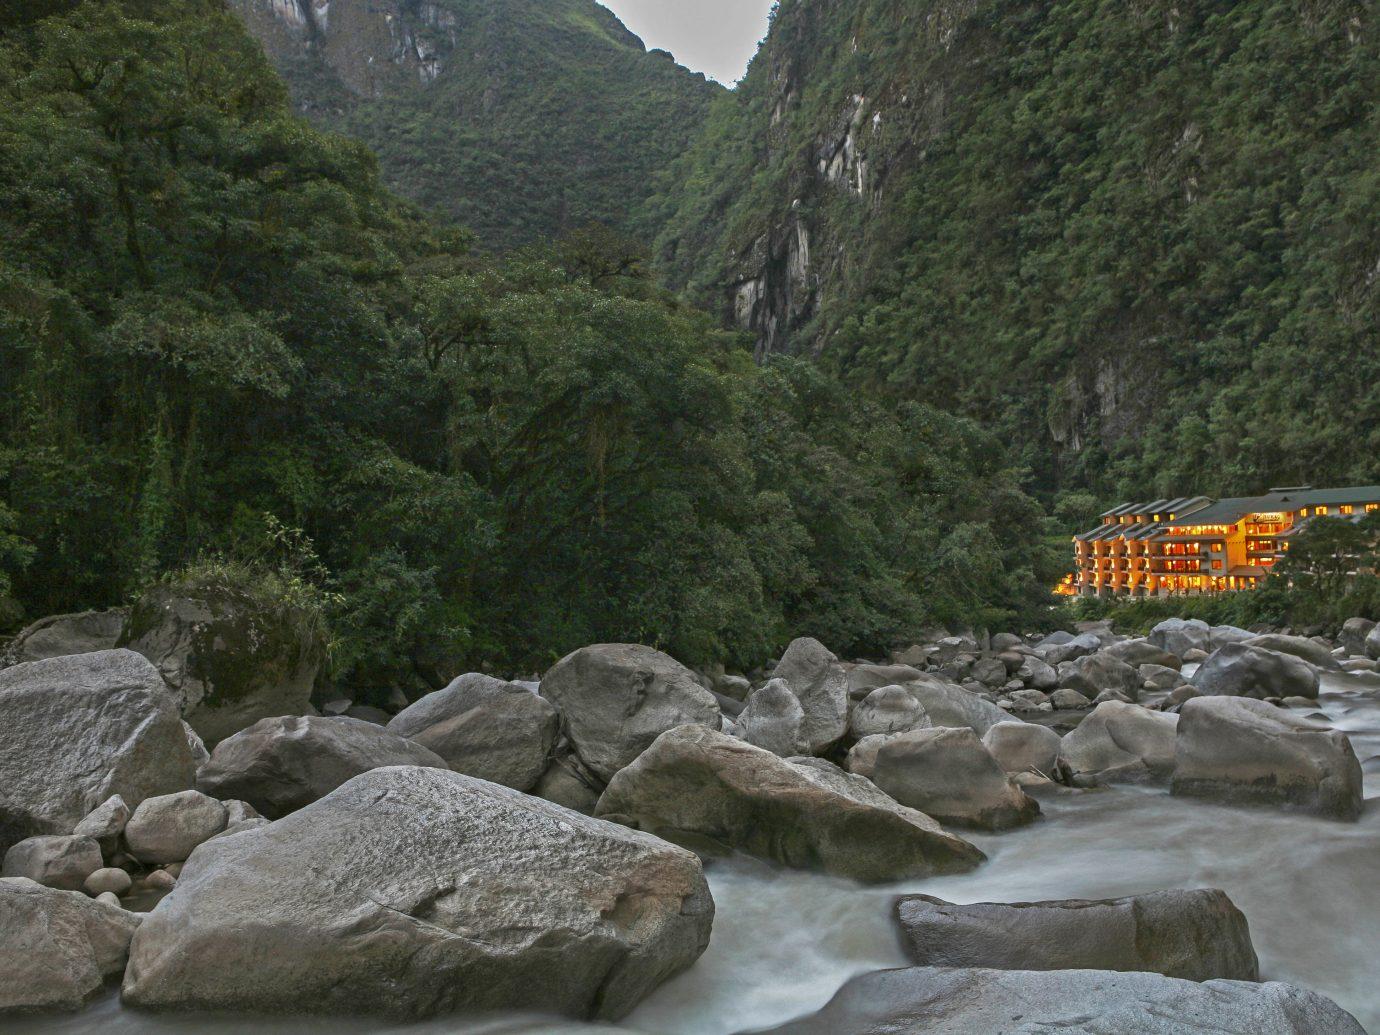 Exterior of Sumaq Machu Picchu Hotel